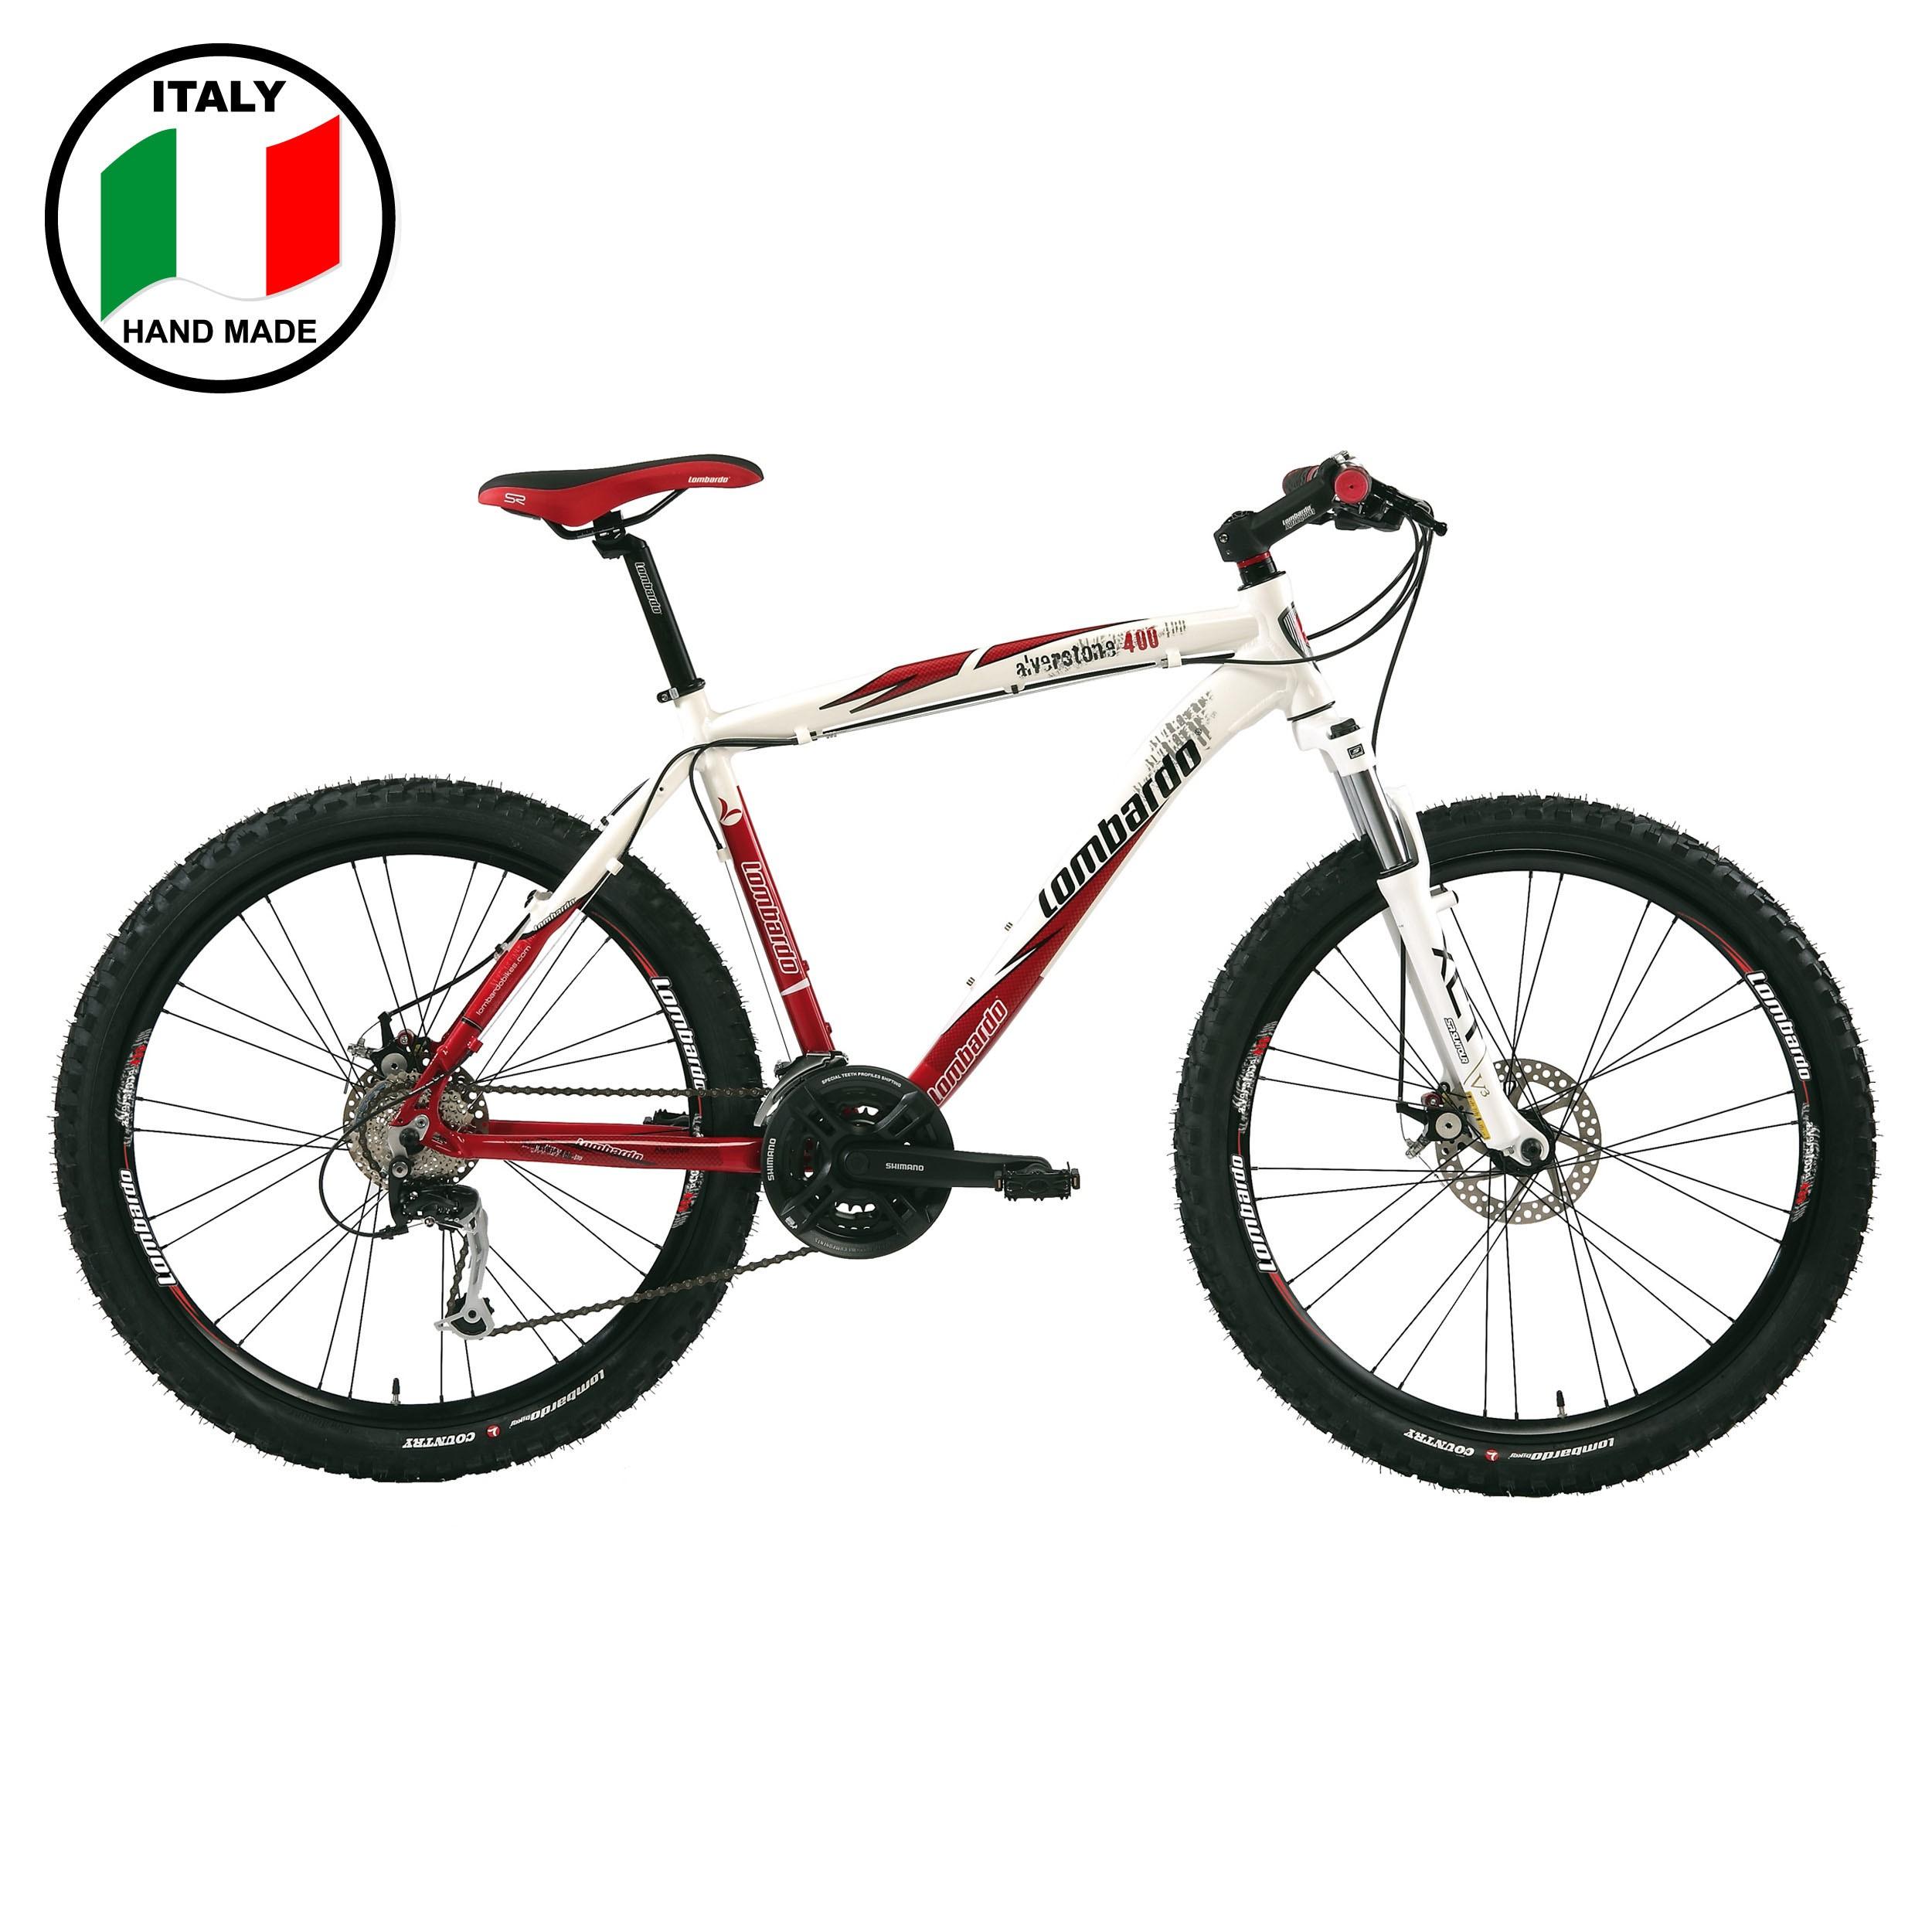 Lombardo Alverstone 400 26 inch Bike- White and Red